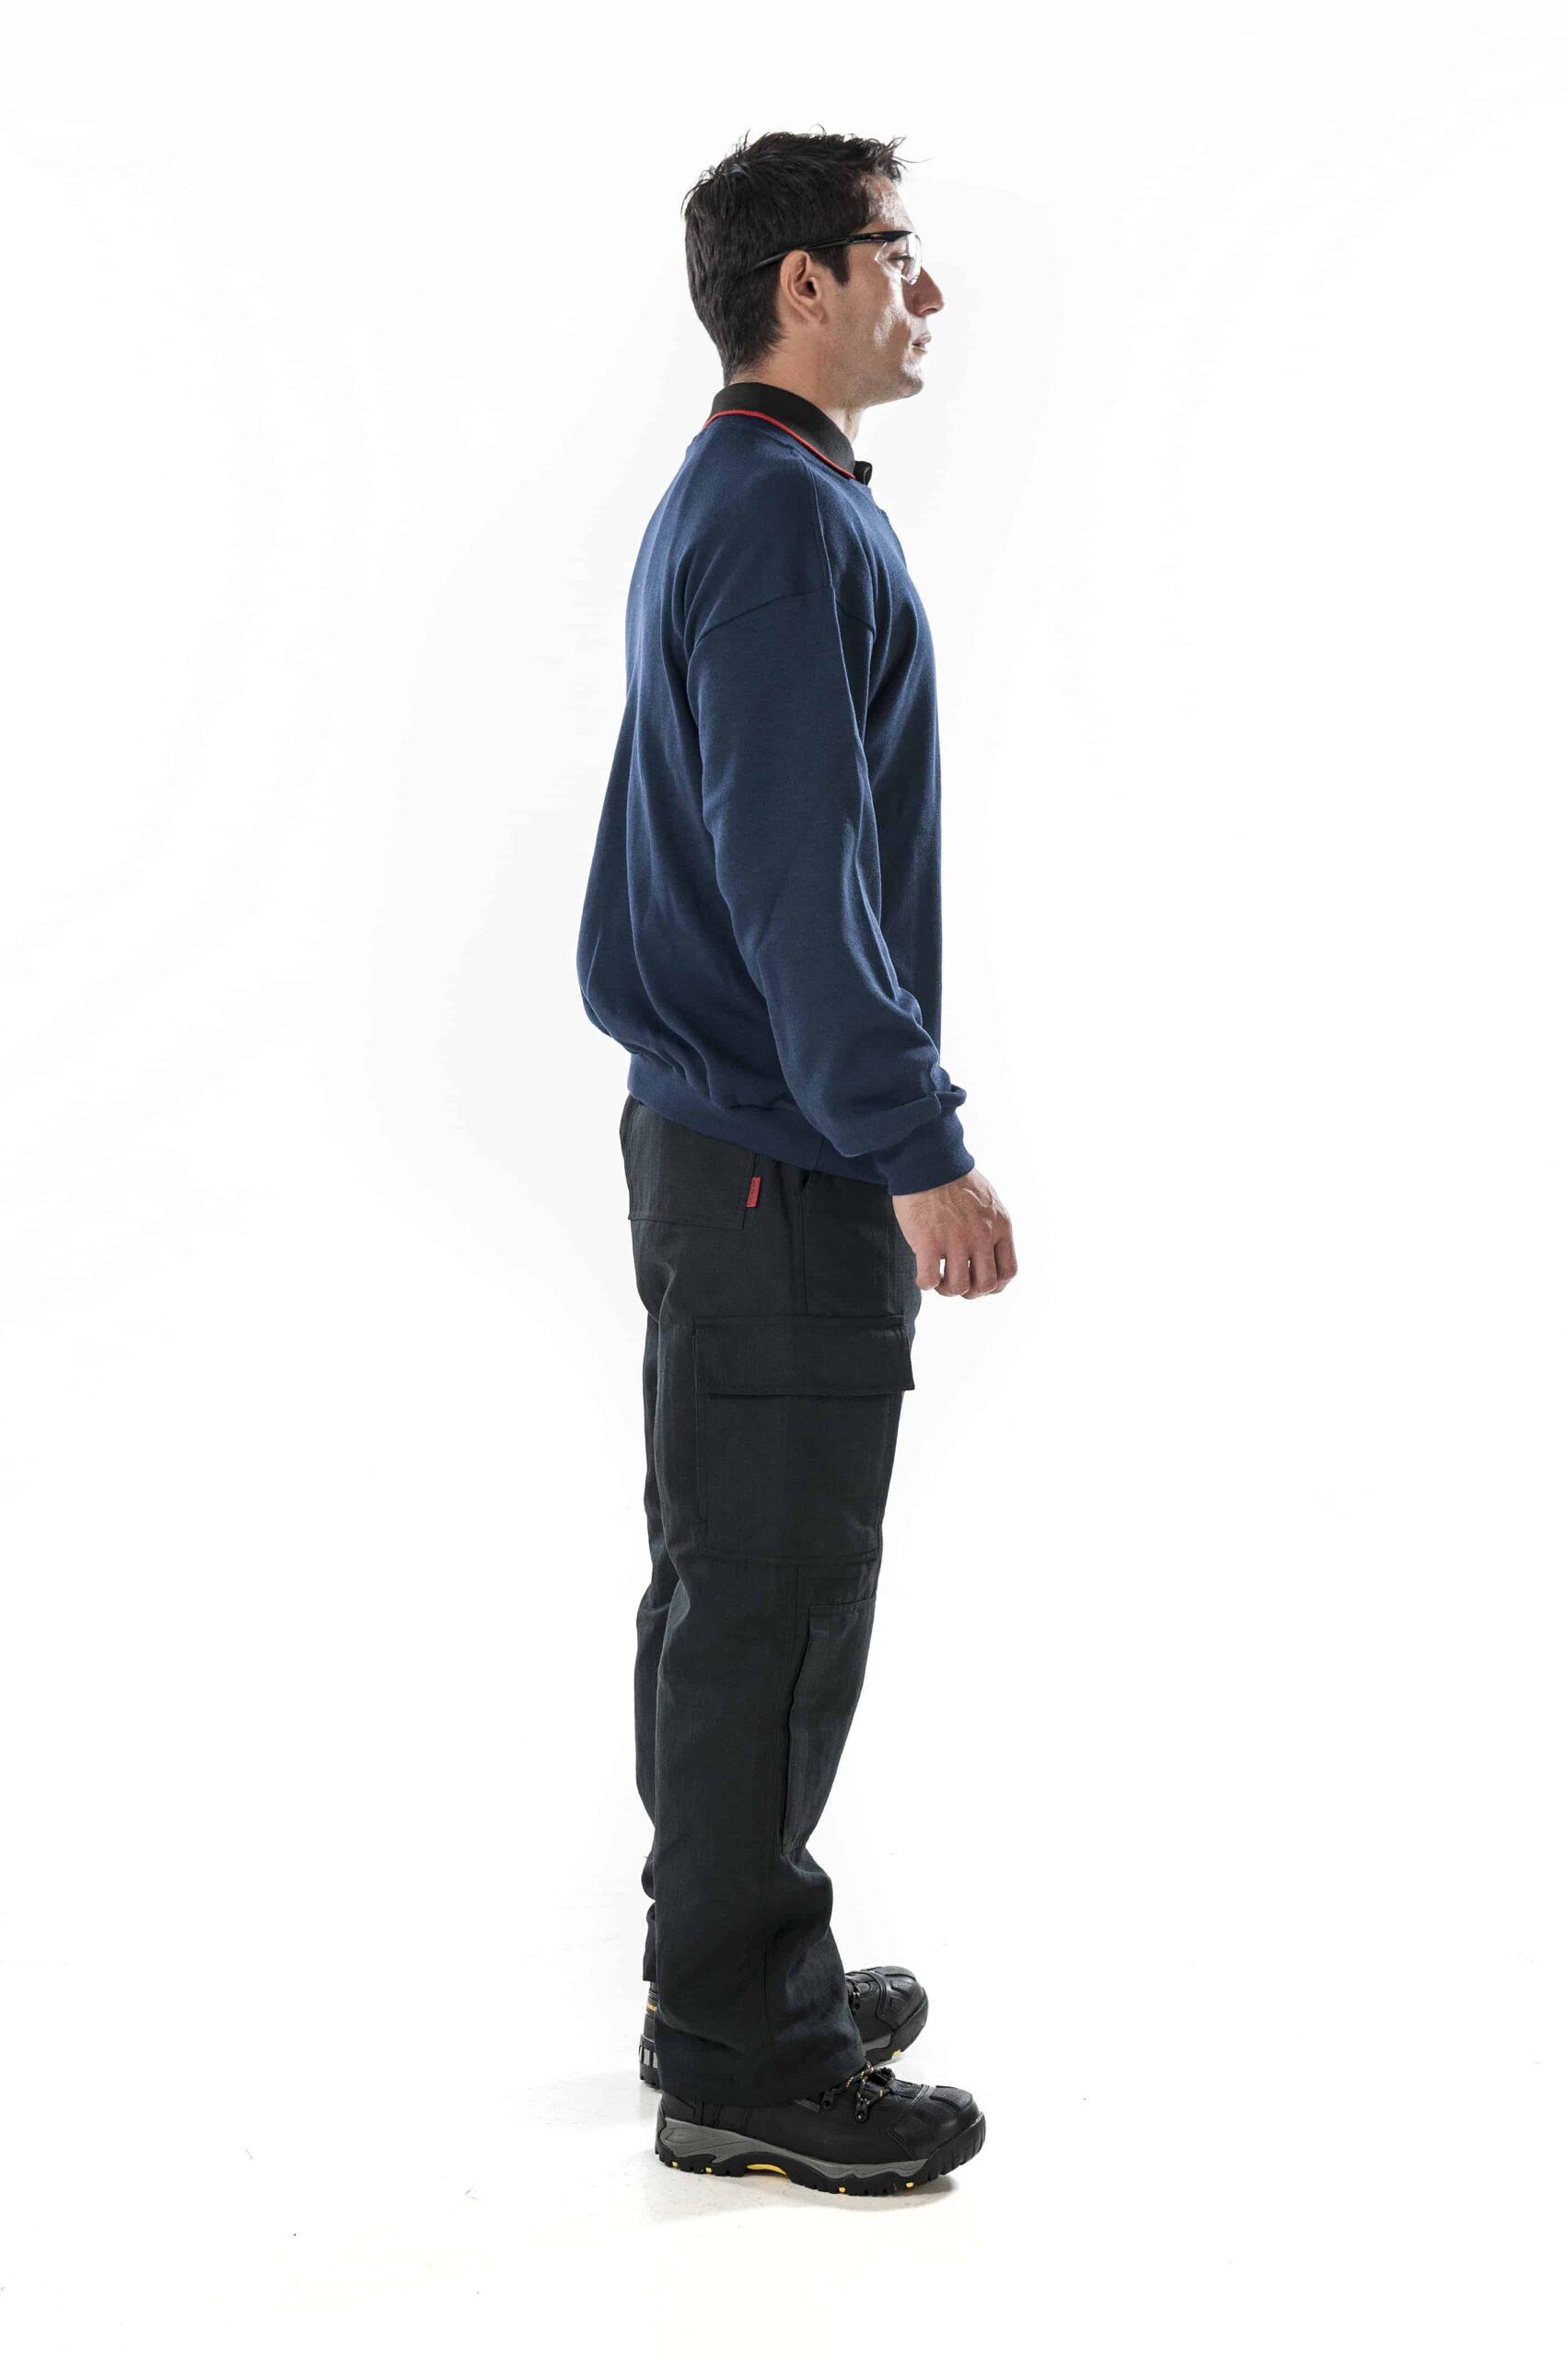 ArcBan® Blue Sweatshirt right side